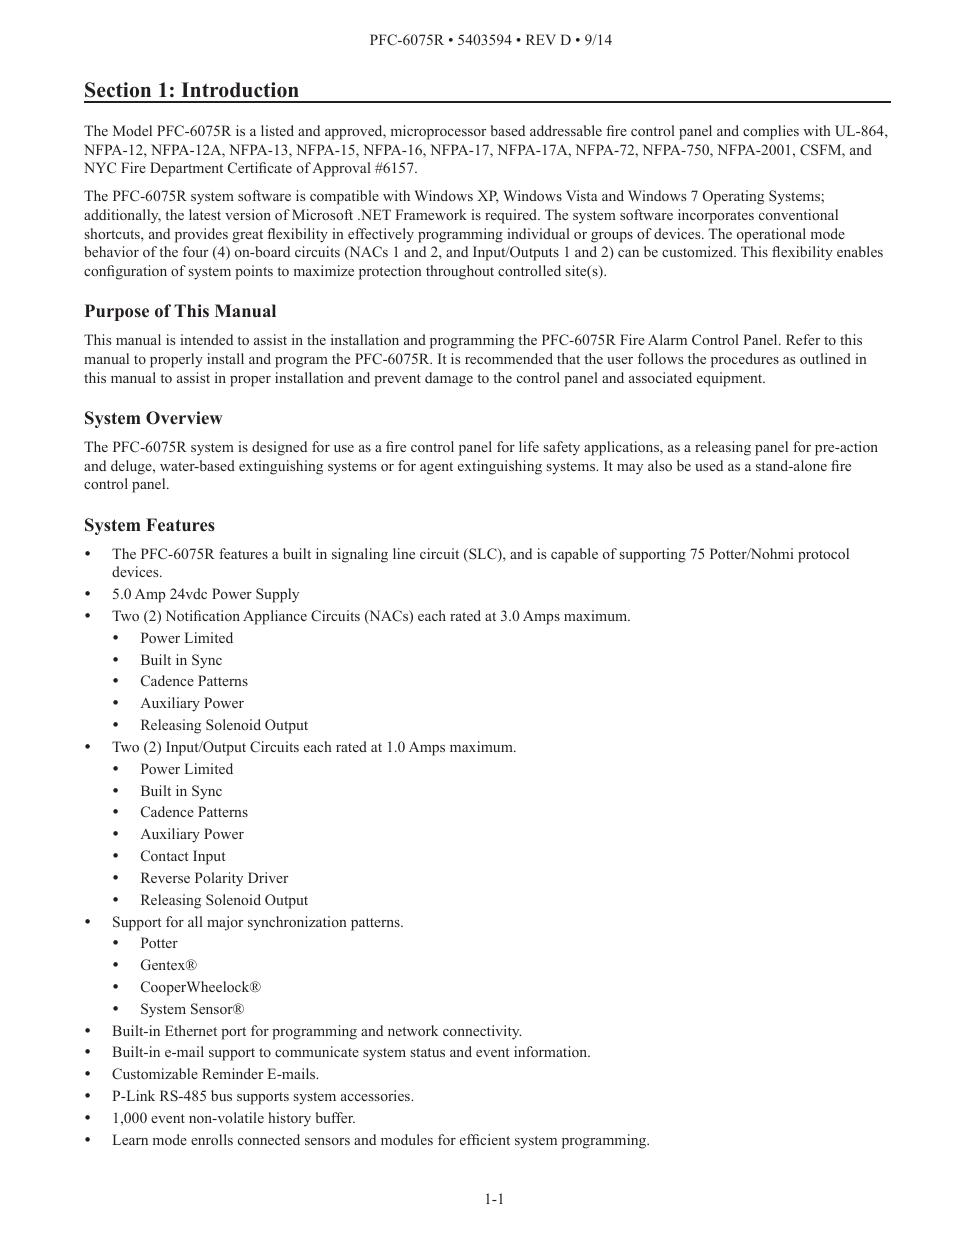 Potter PFC-6075R User Manual | Page 7 / 136